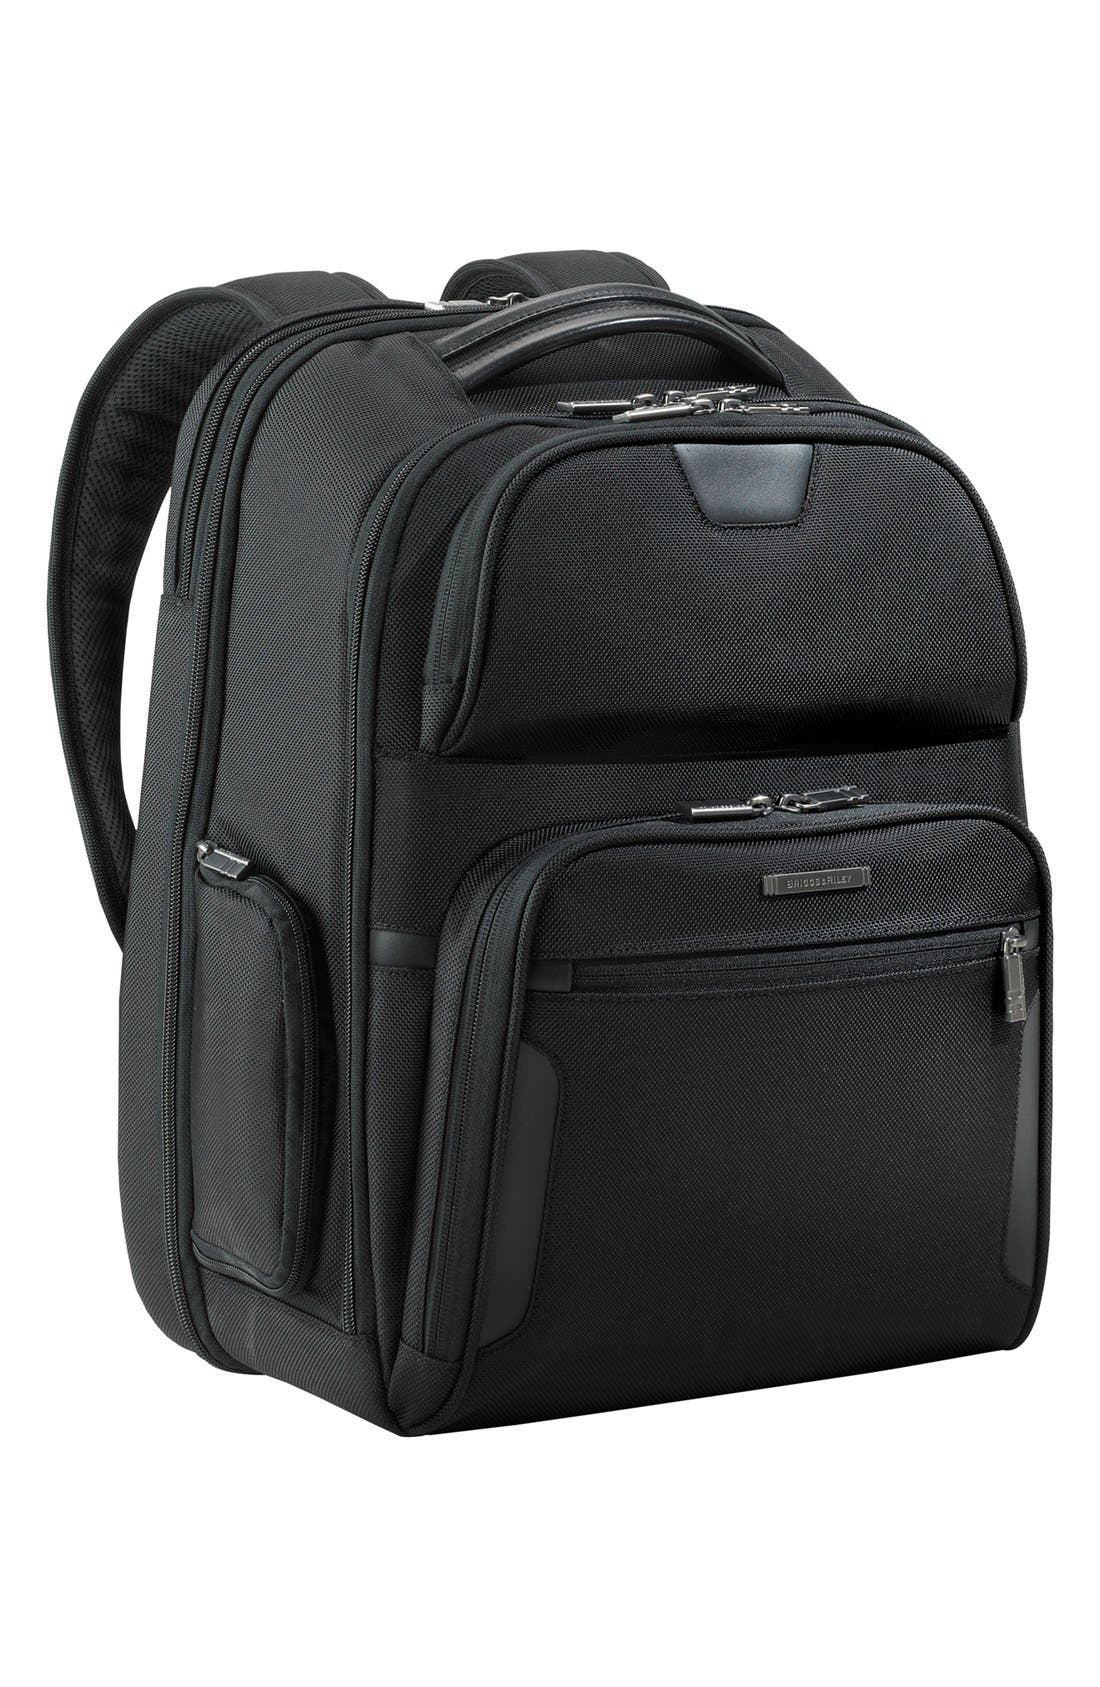 Briggs & Riley 'Large' Ballistic Nylon Clamshell Backpack